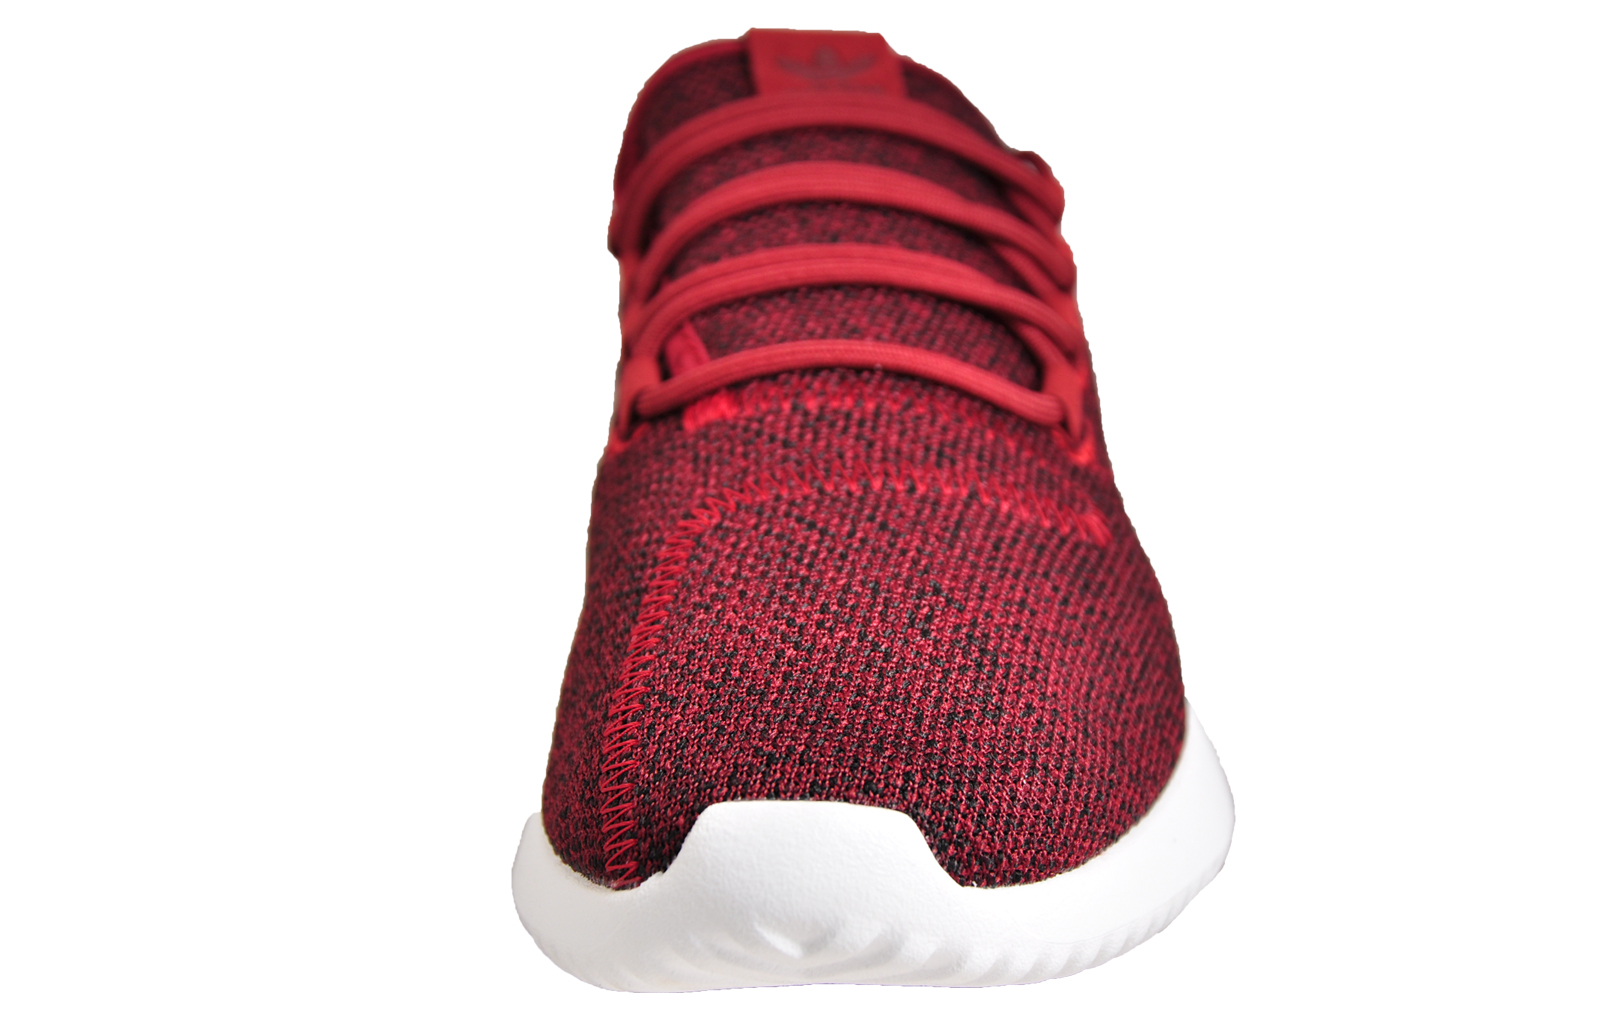 new styles a8d79 897a0 Adidas Originals Tubular Shadow Womens -